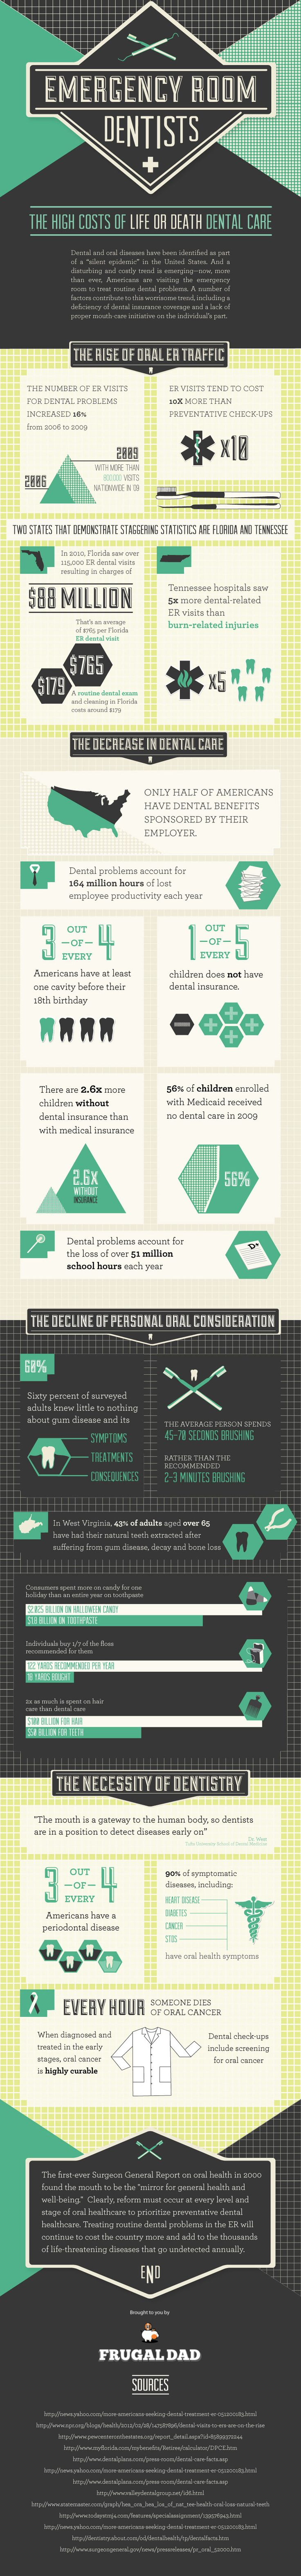 Emergency Room Dentists Infographic. Paul L. Vitsky, DDS - pediatric dentist in Fredericksburg, VA @ www.fredericksburgpediatricdentist.com